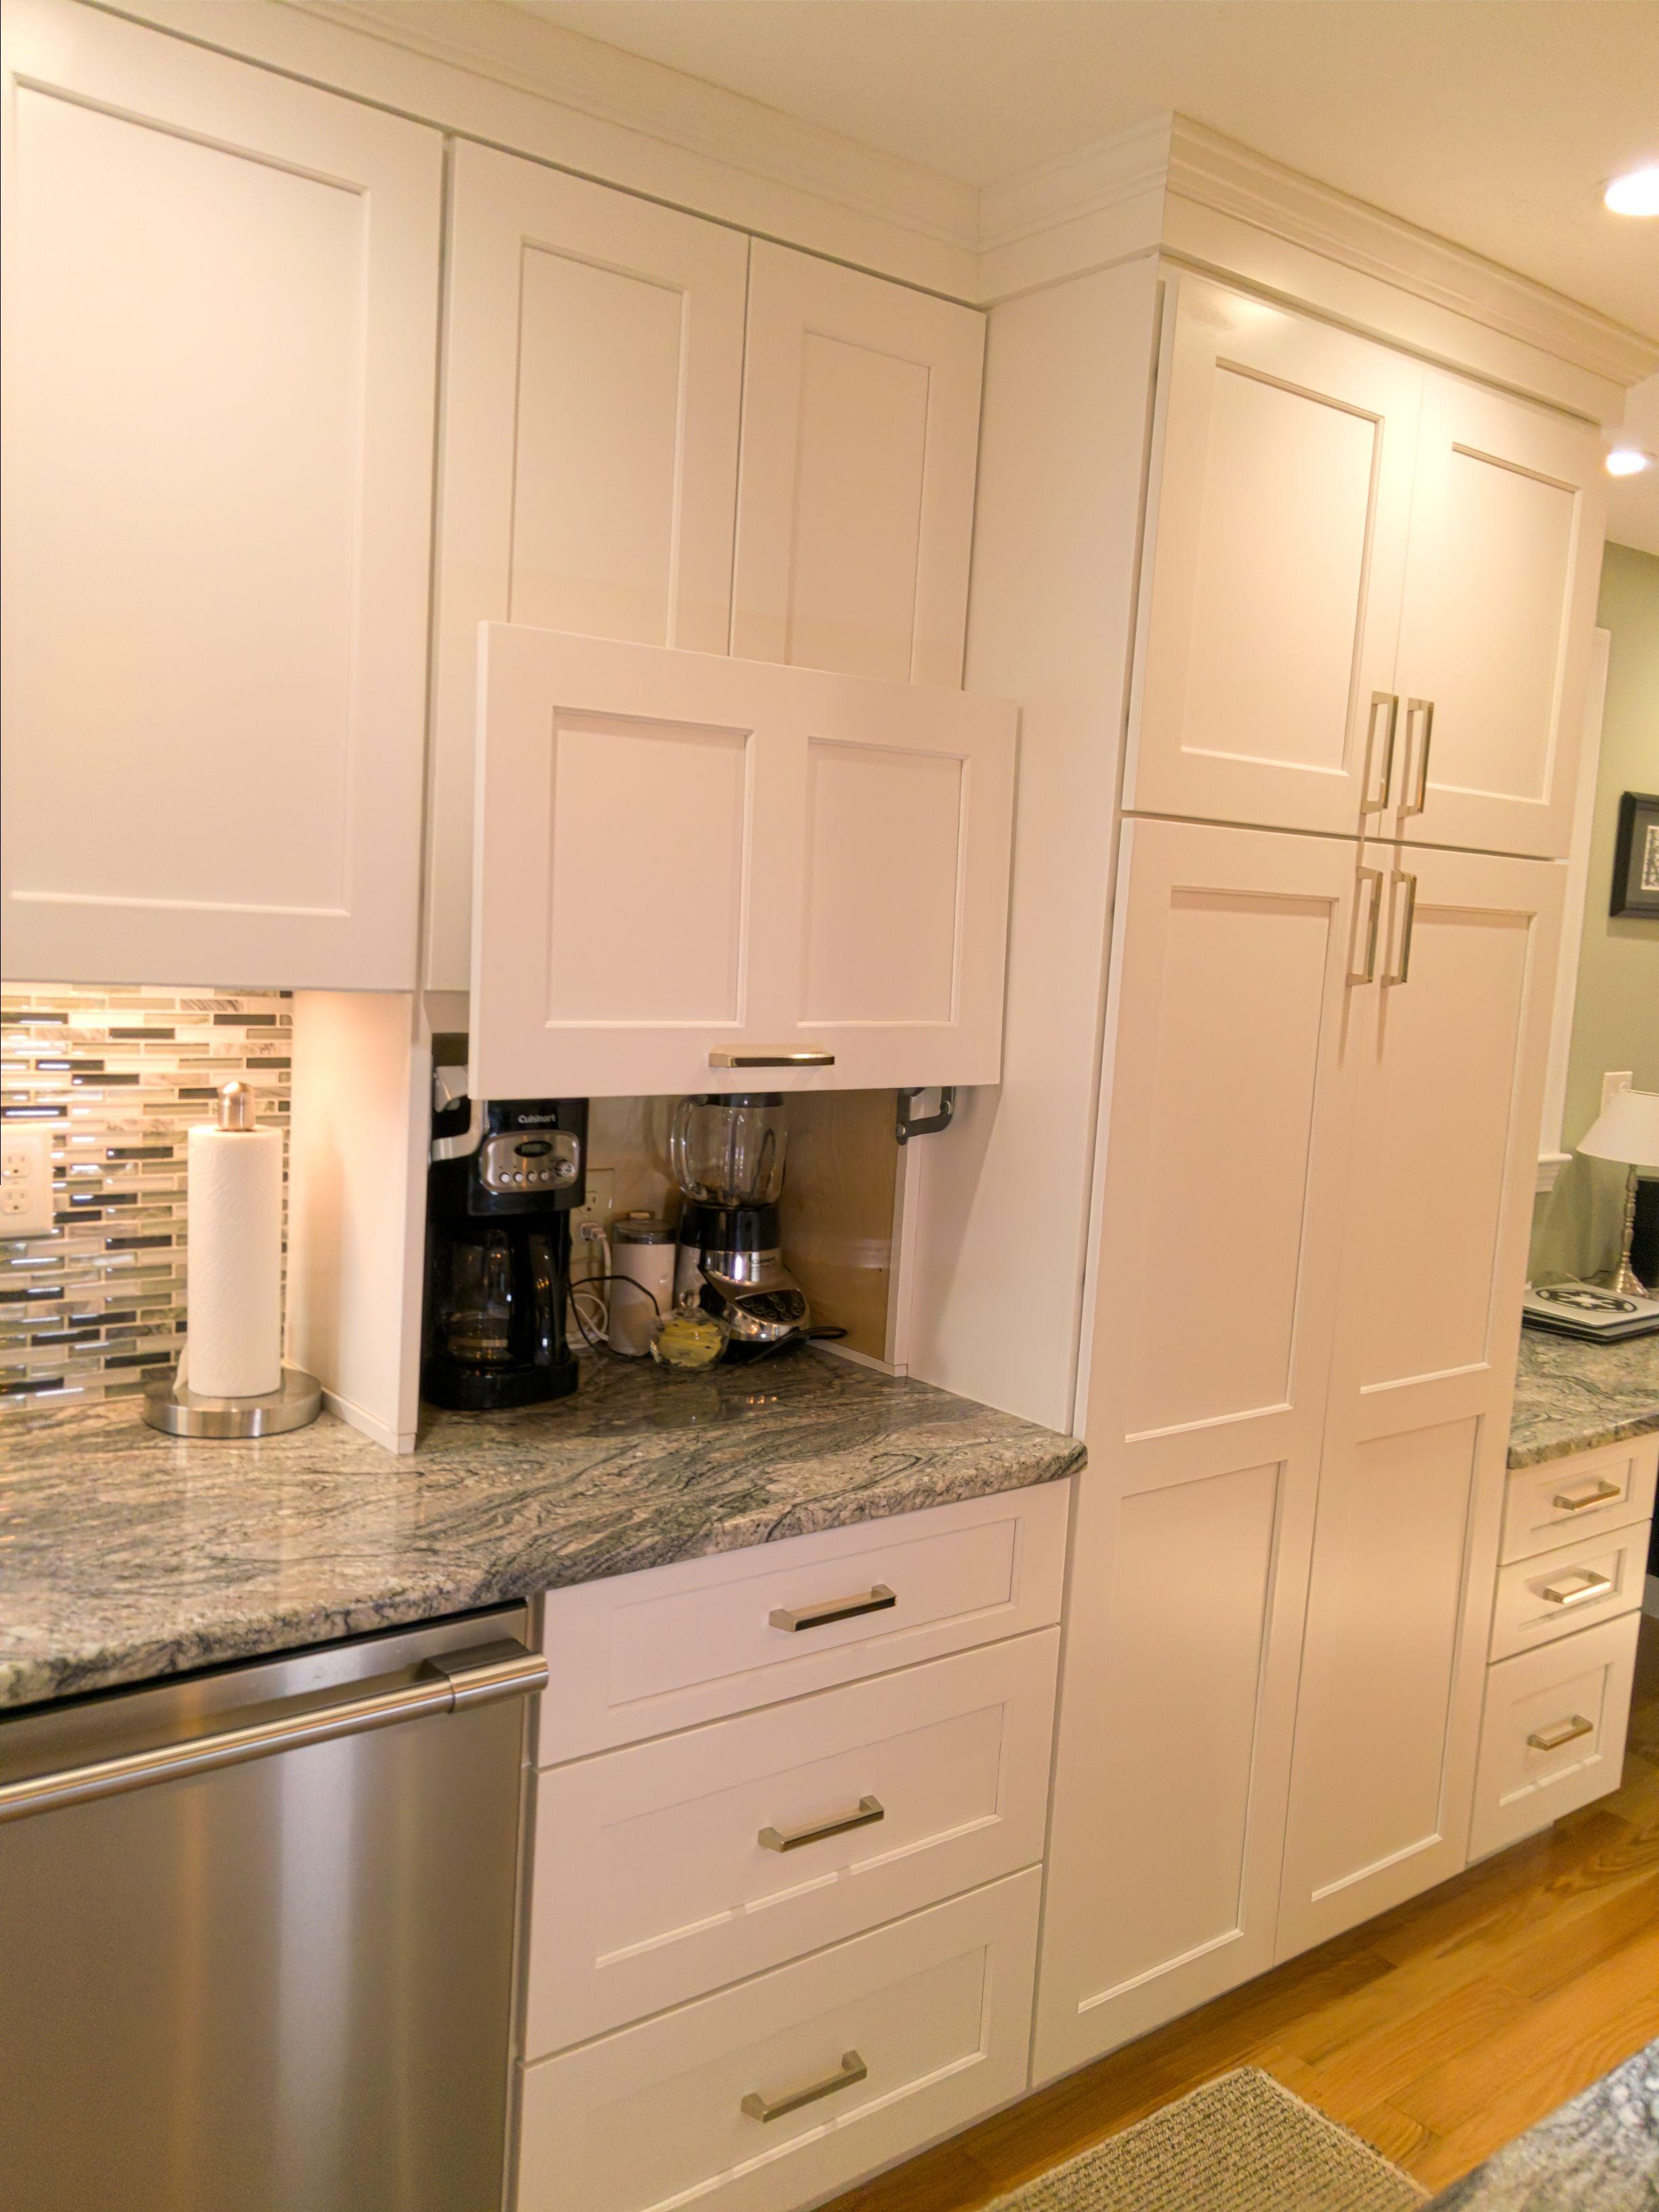 hide kitchen appliances for a cleaner counter top kitchen design decor kitchen remodel plans on kitchen remodel appliances id=24008